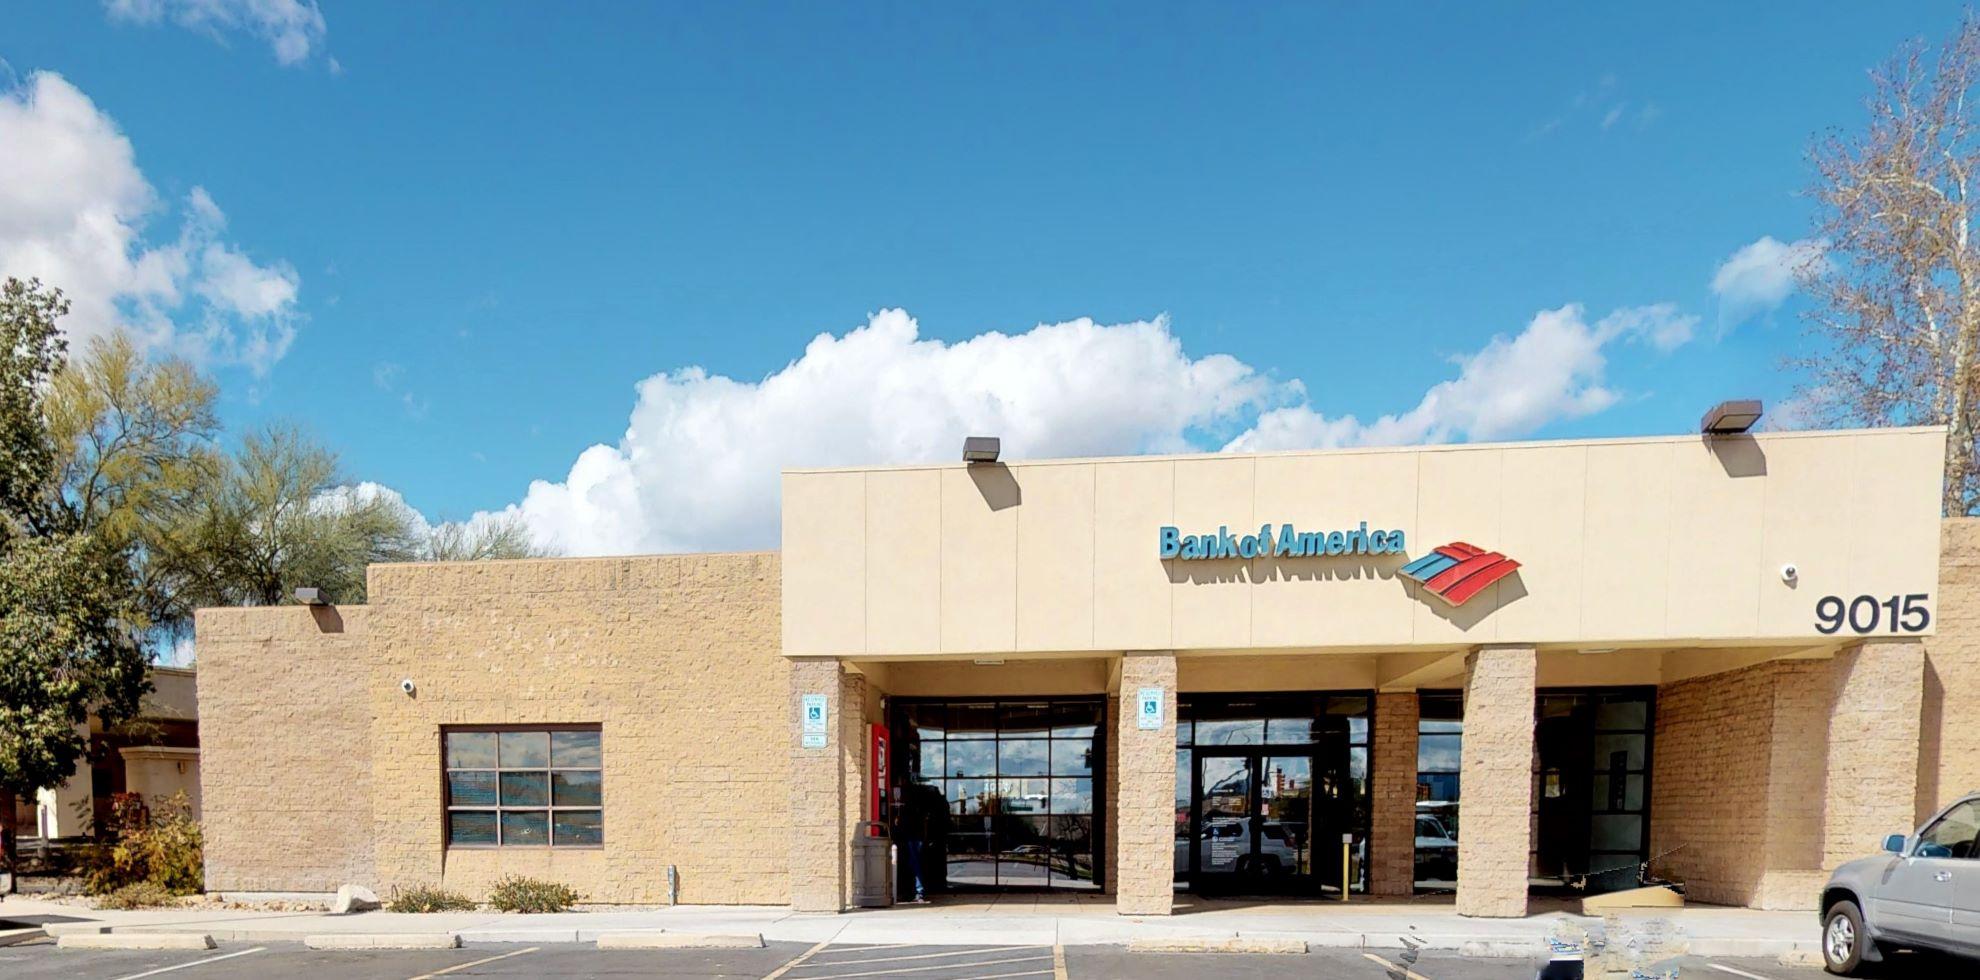 Bank of America financial center with drive-thru ATM   9015 E Tanque Verde Rd, Tucson, AZ 85749